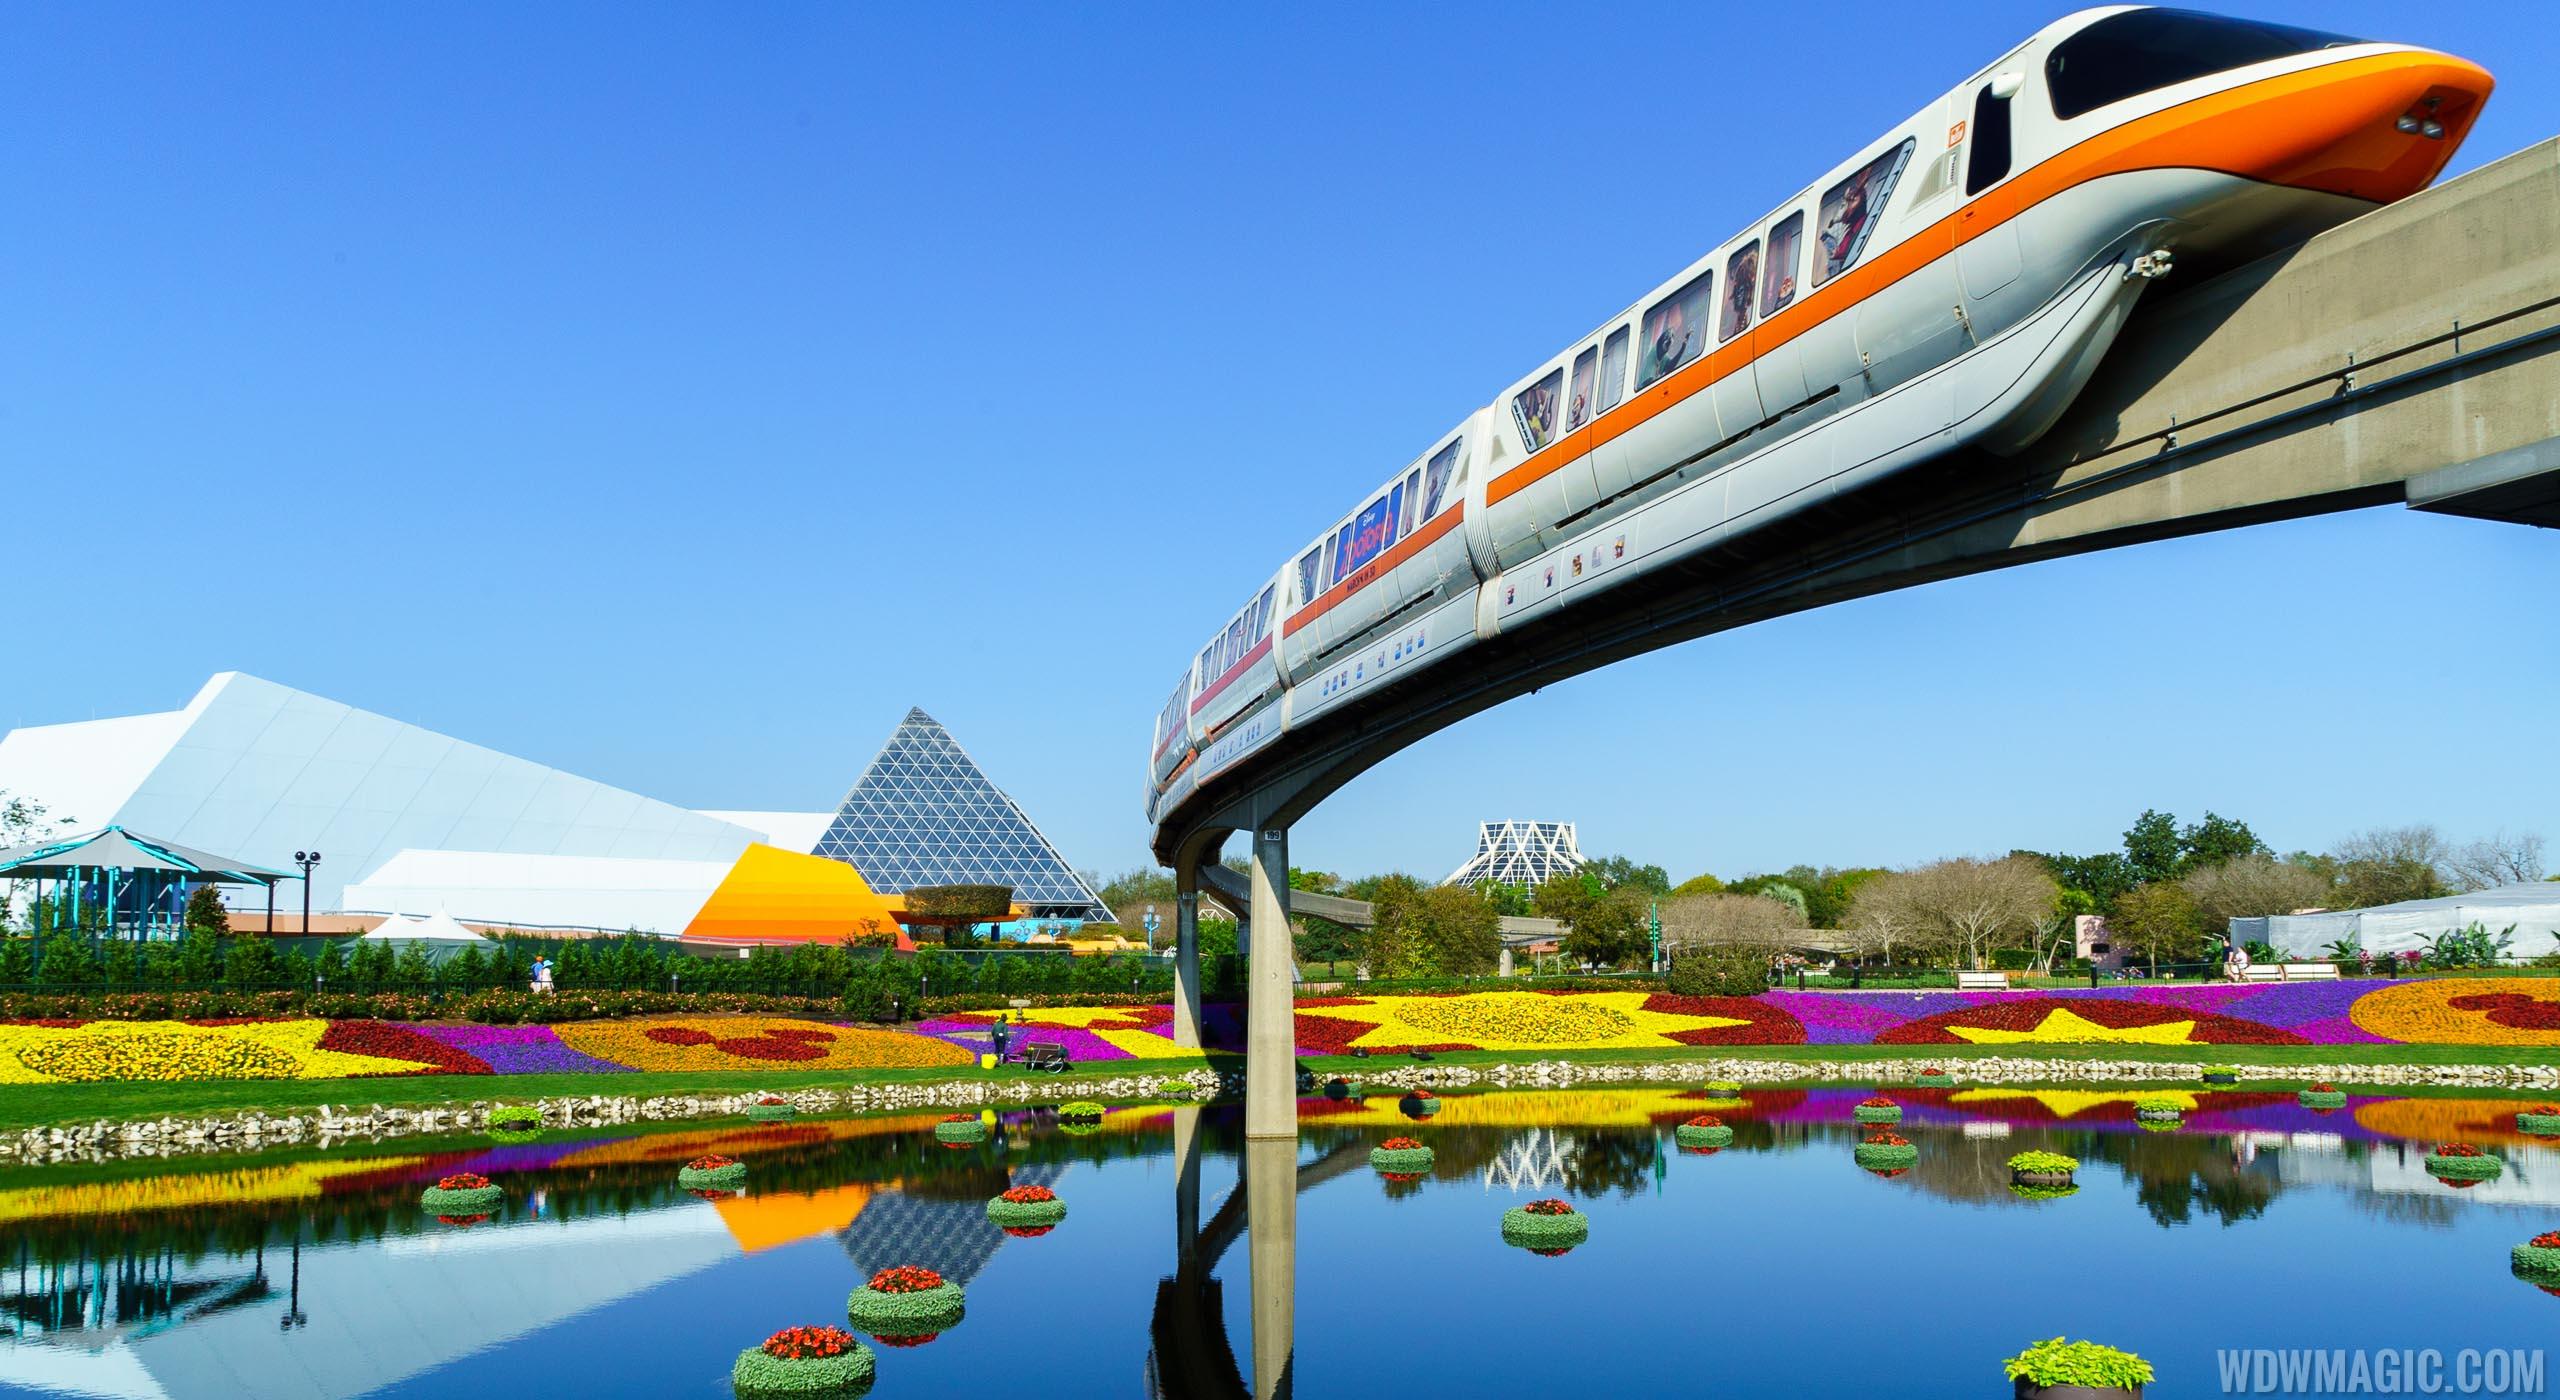 Monorail Orange glides above the Flower & Garden Festival